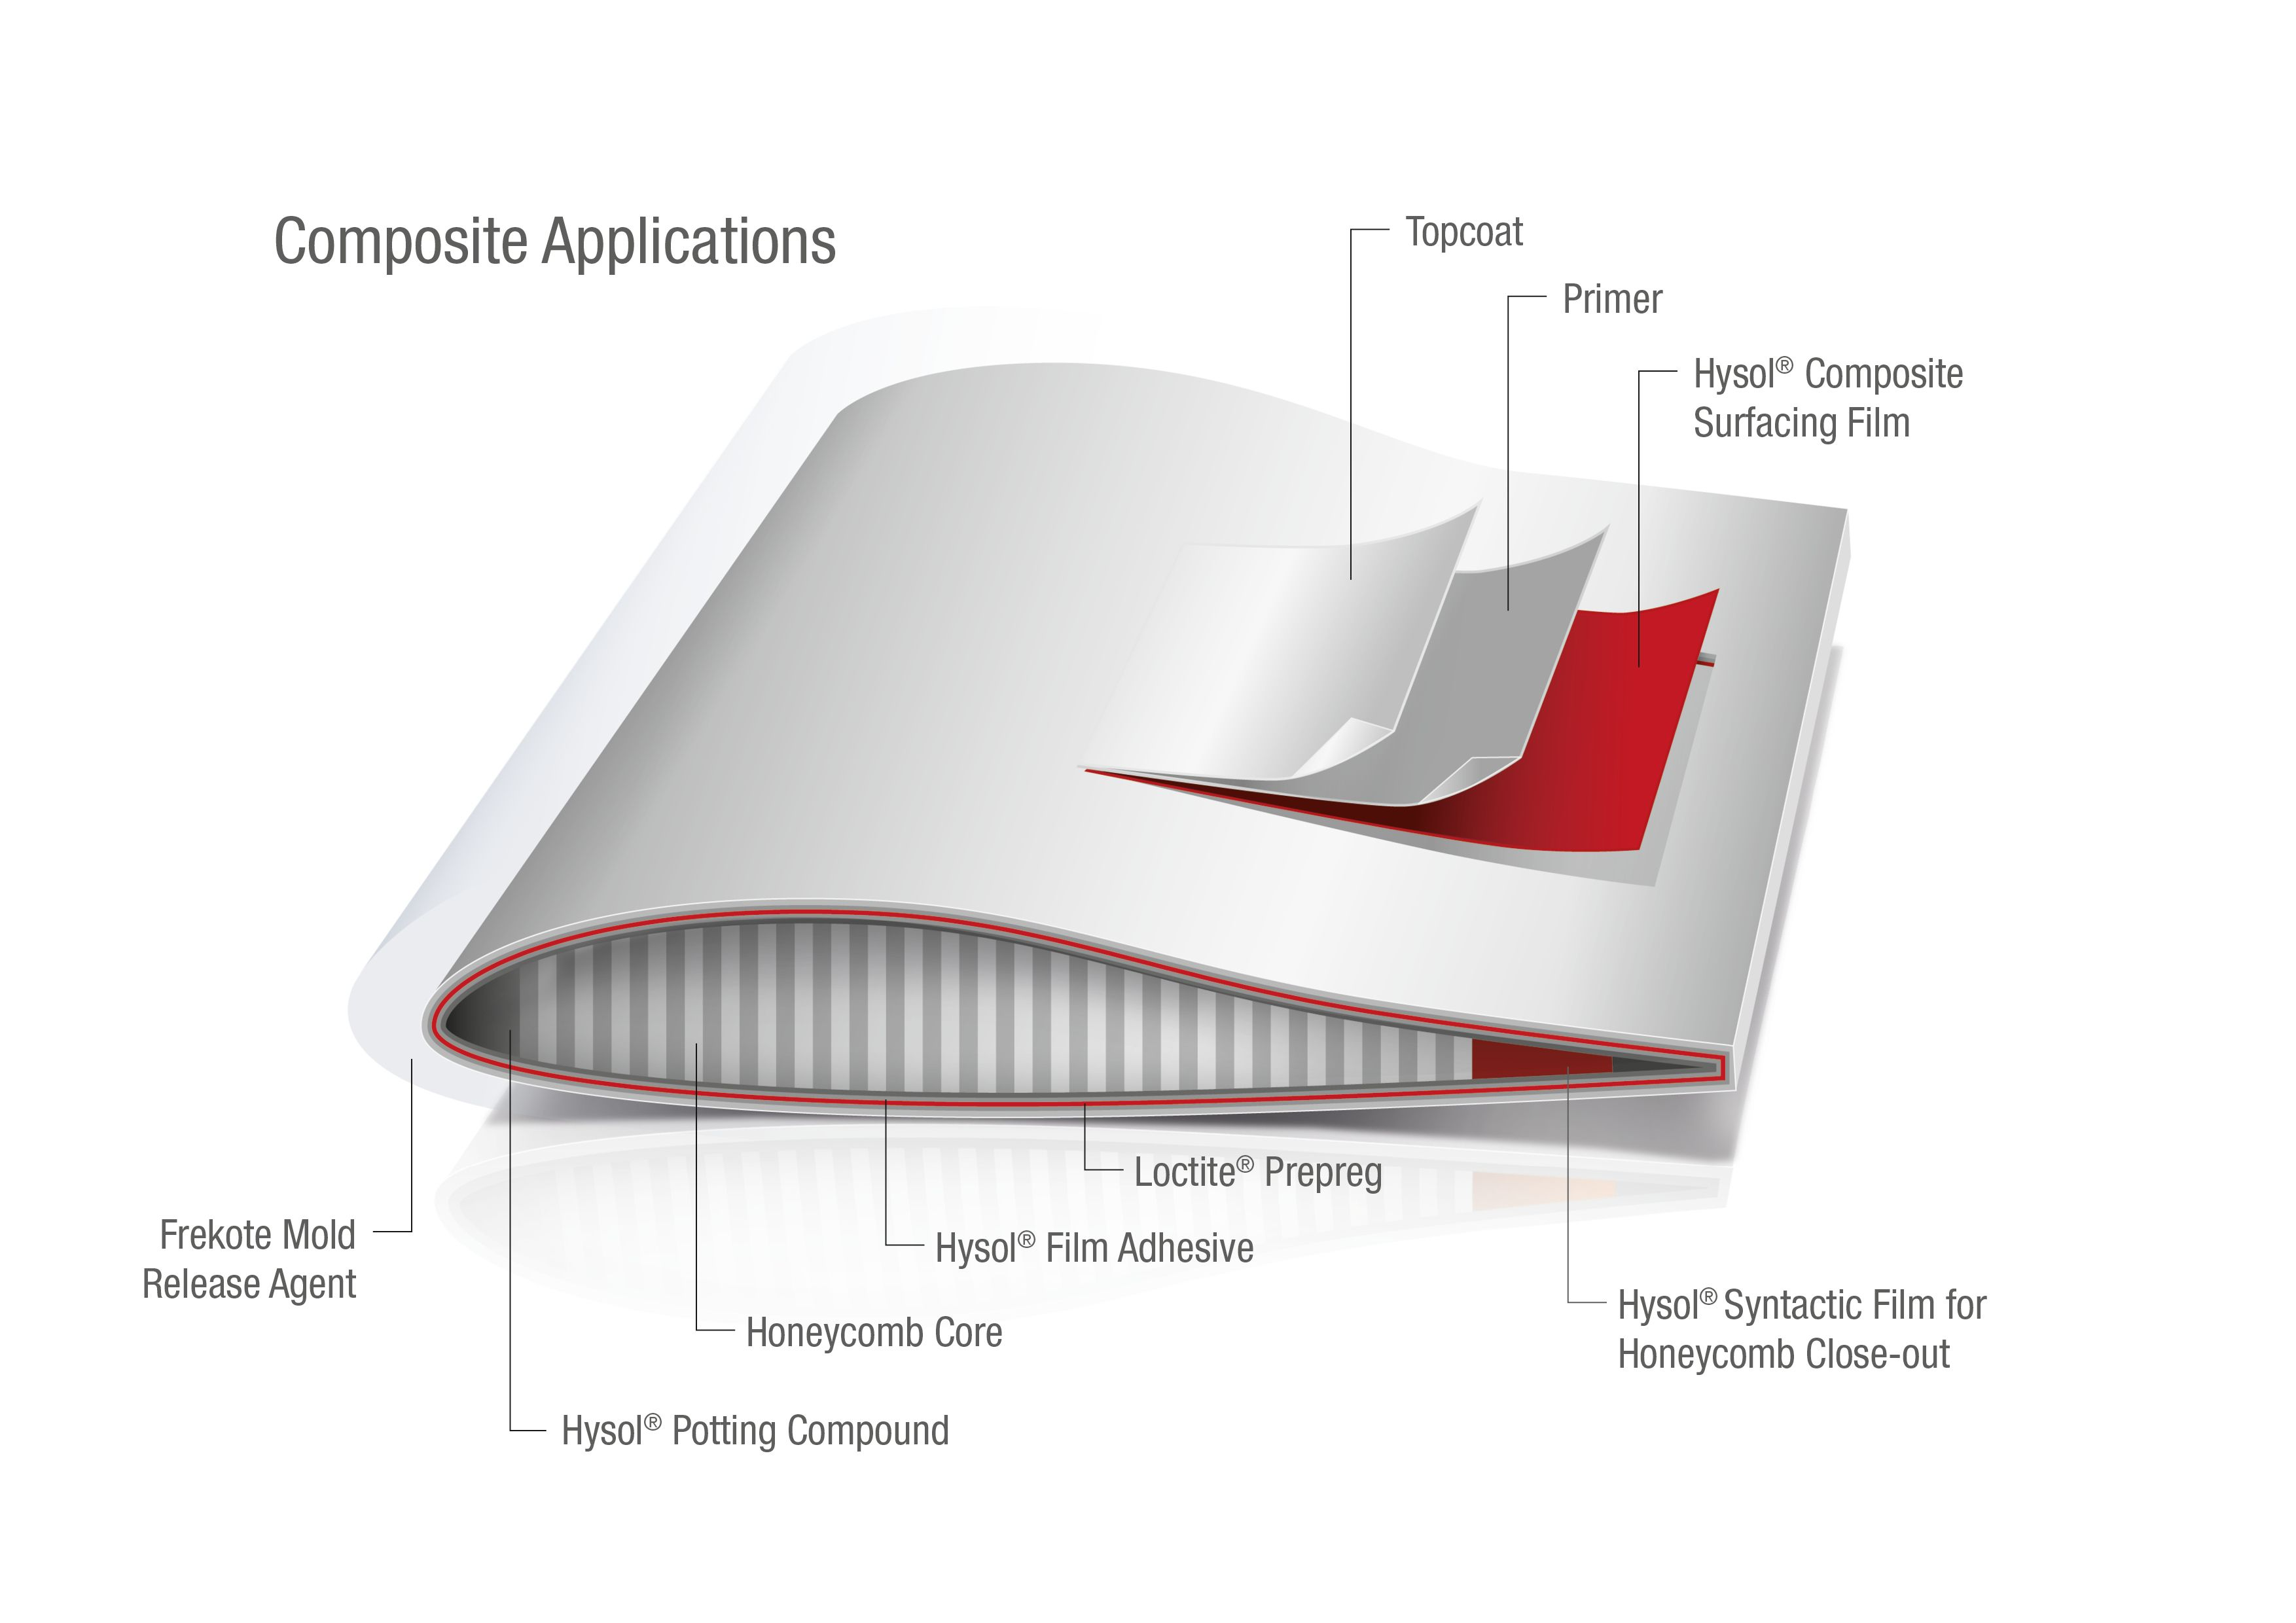 Asa12007 Composite Applications 300dpi 257005 Print 1772h 1772w Jpg 3 508 2 480 Pixeles Syntactic Primer Composition